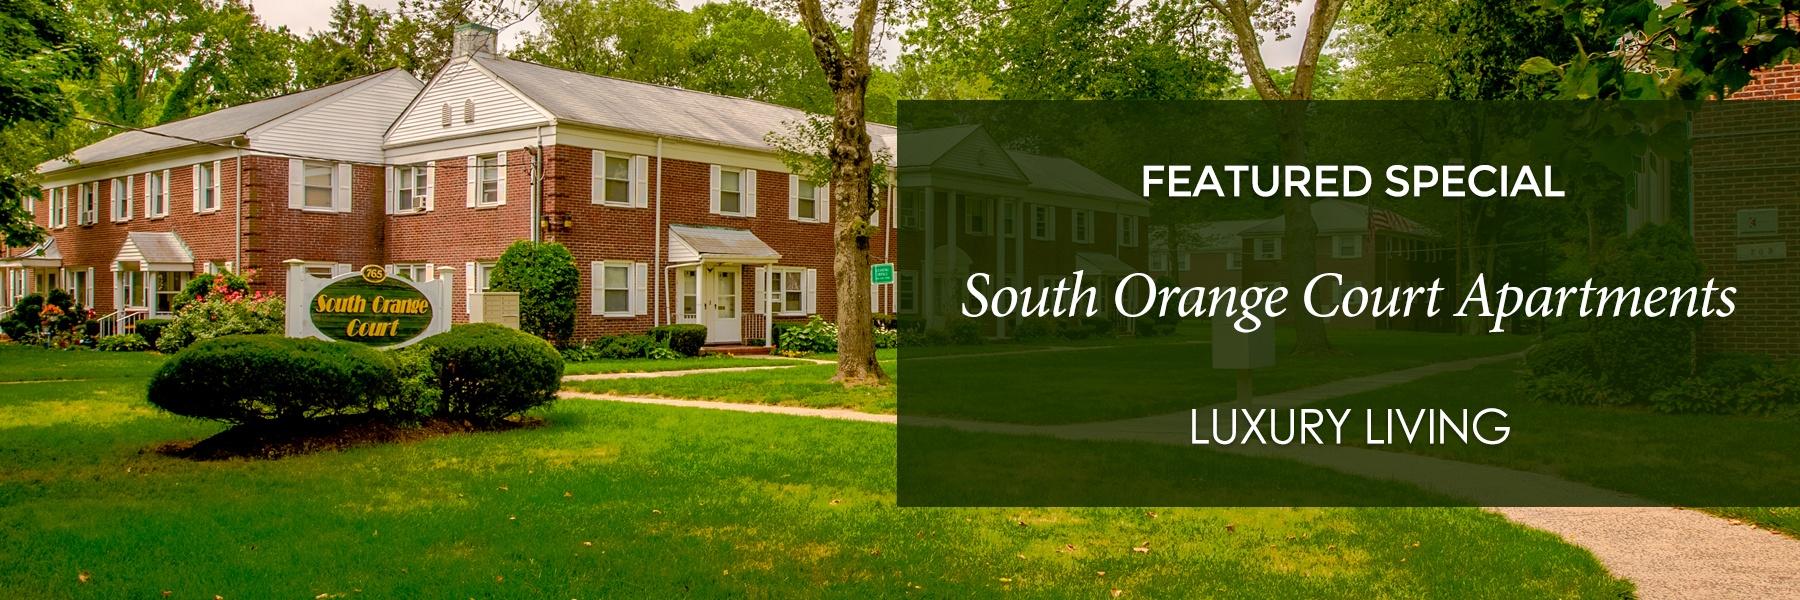 South Orange Court Apartments For Rent in Orange, NJ Specials